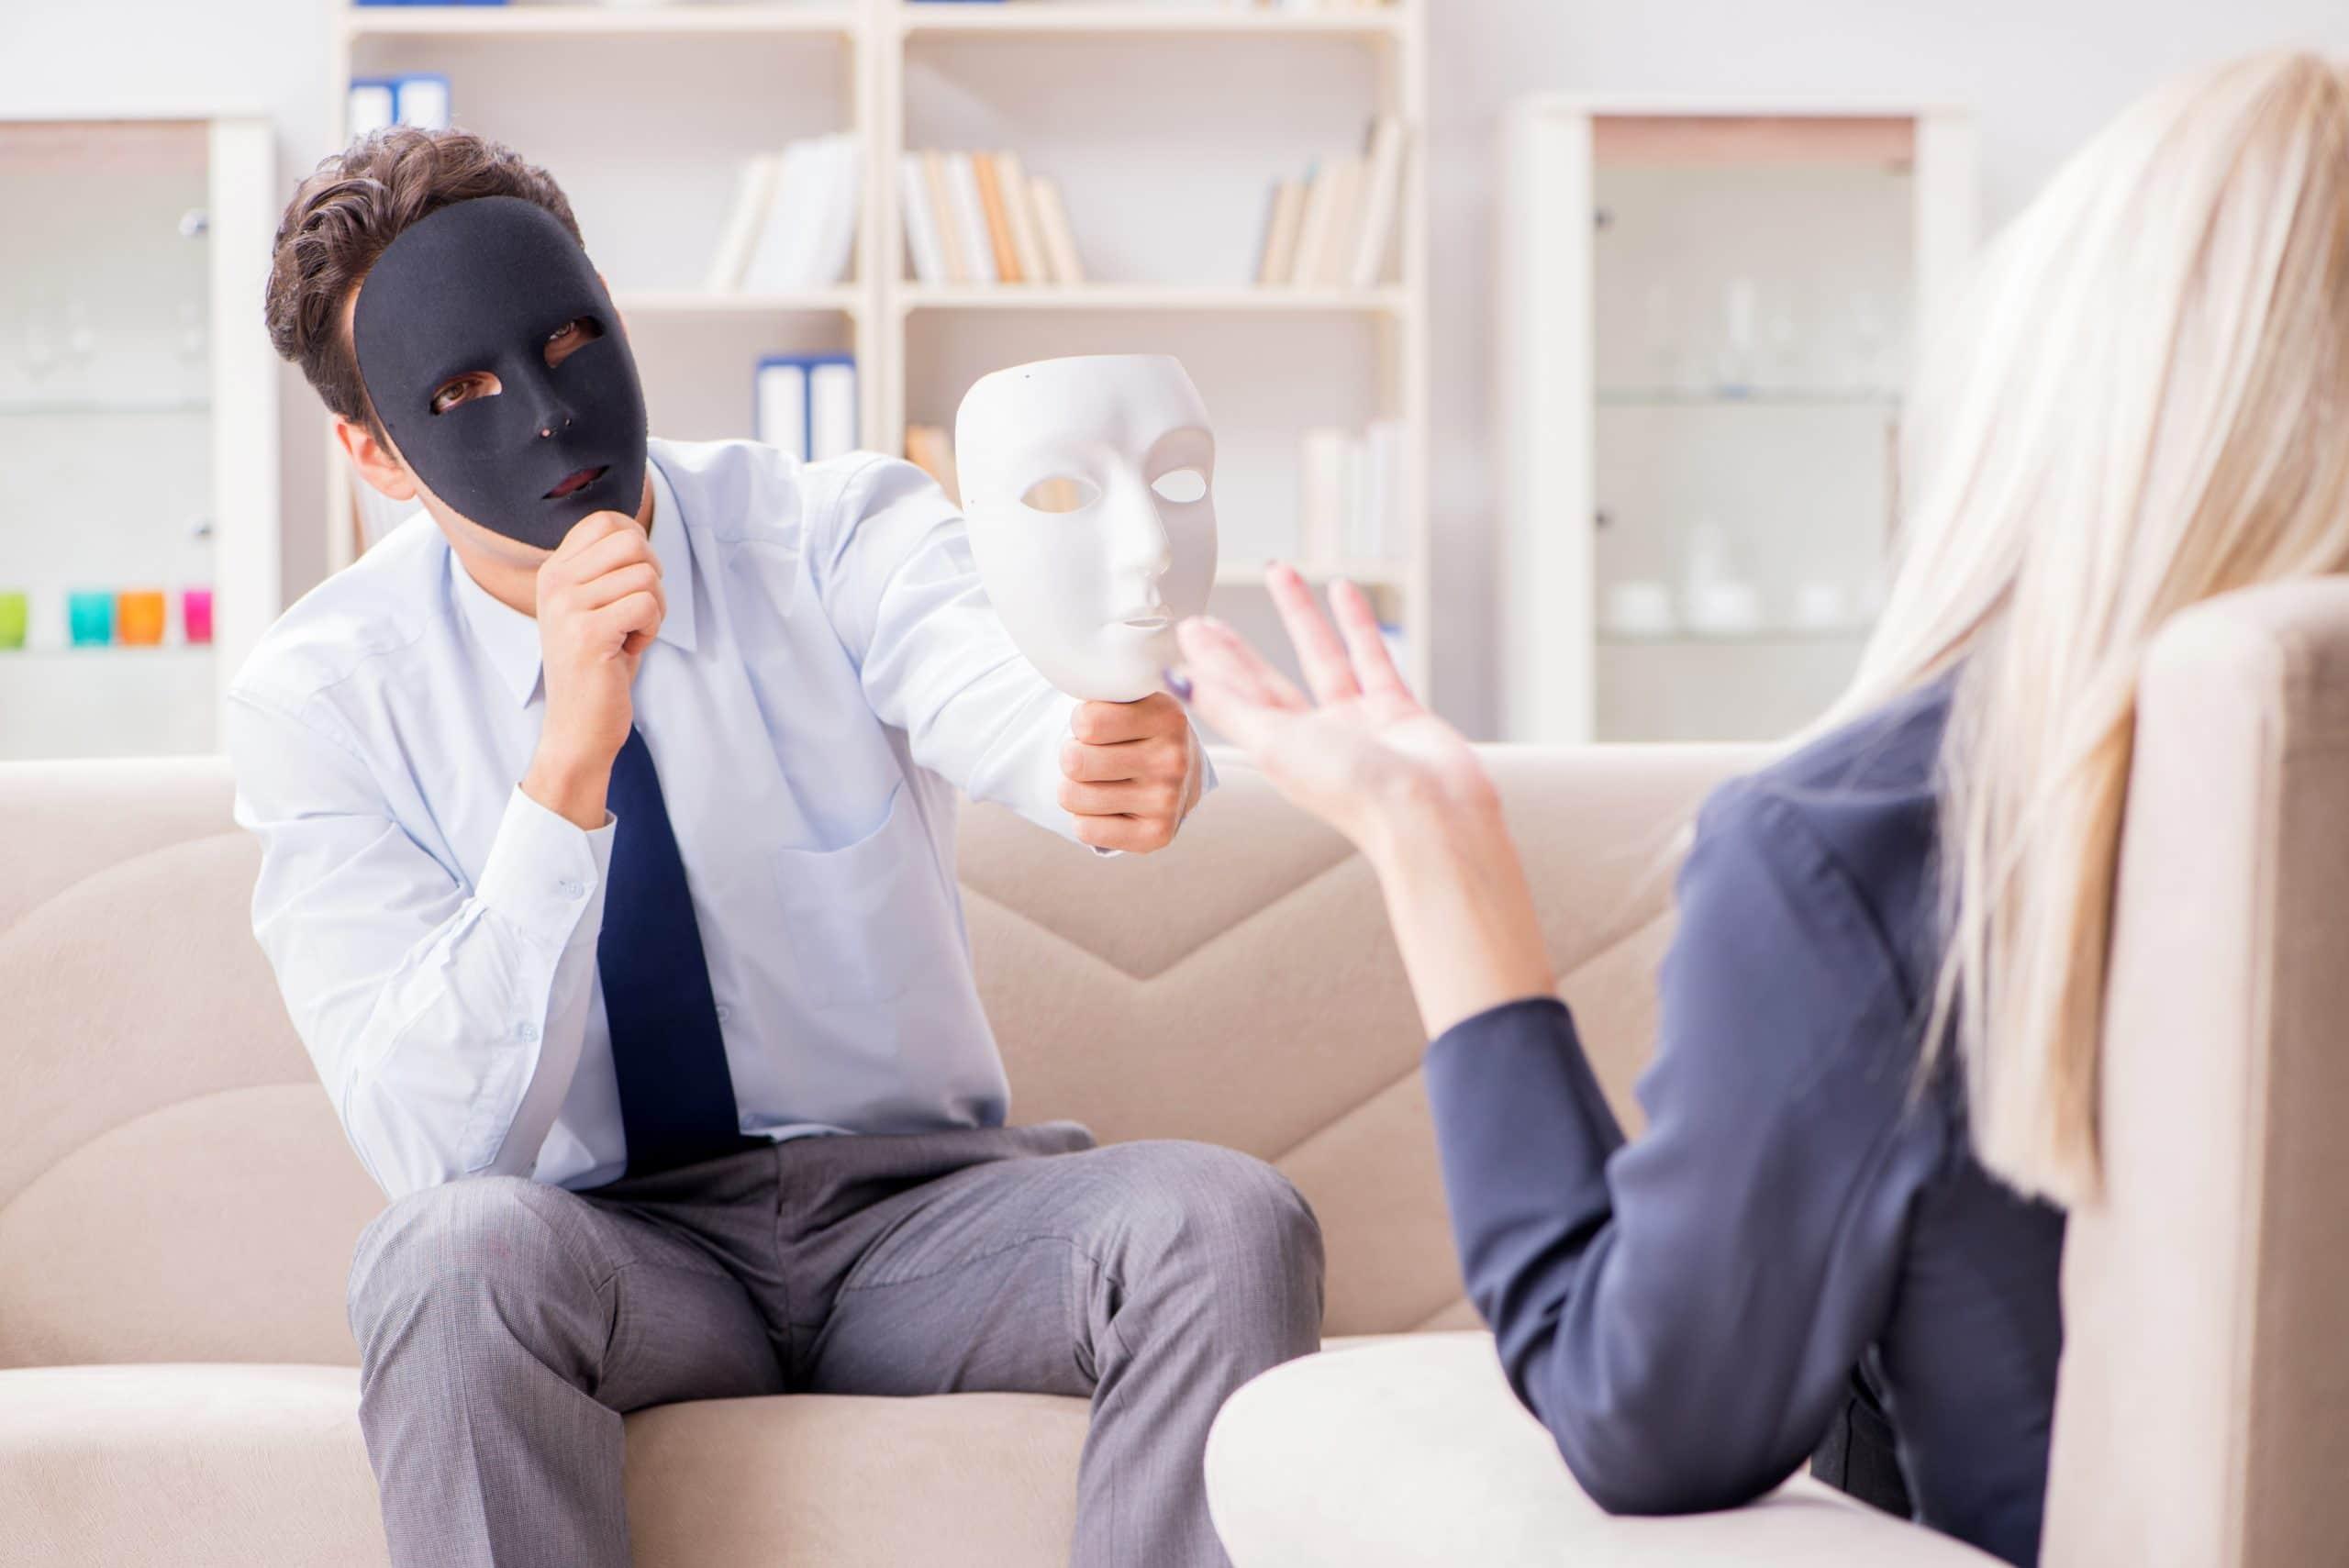 Homem segurando máscara